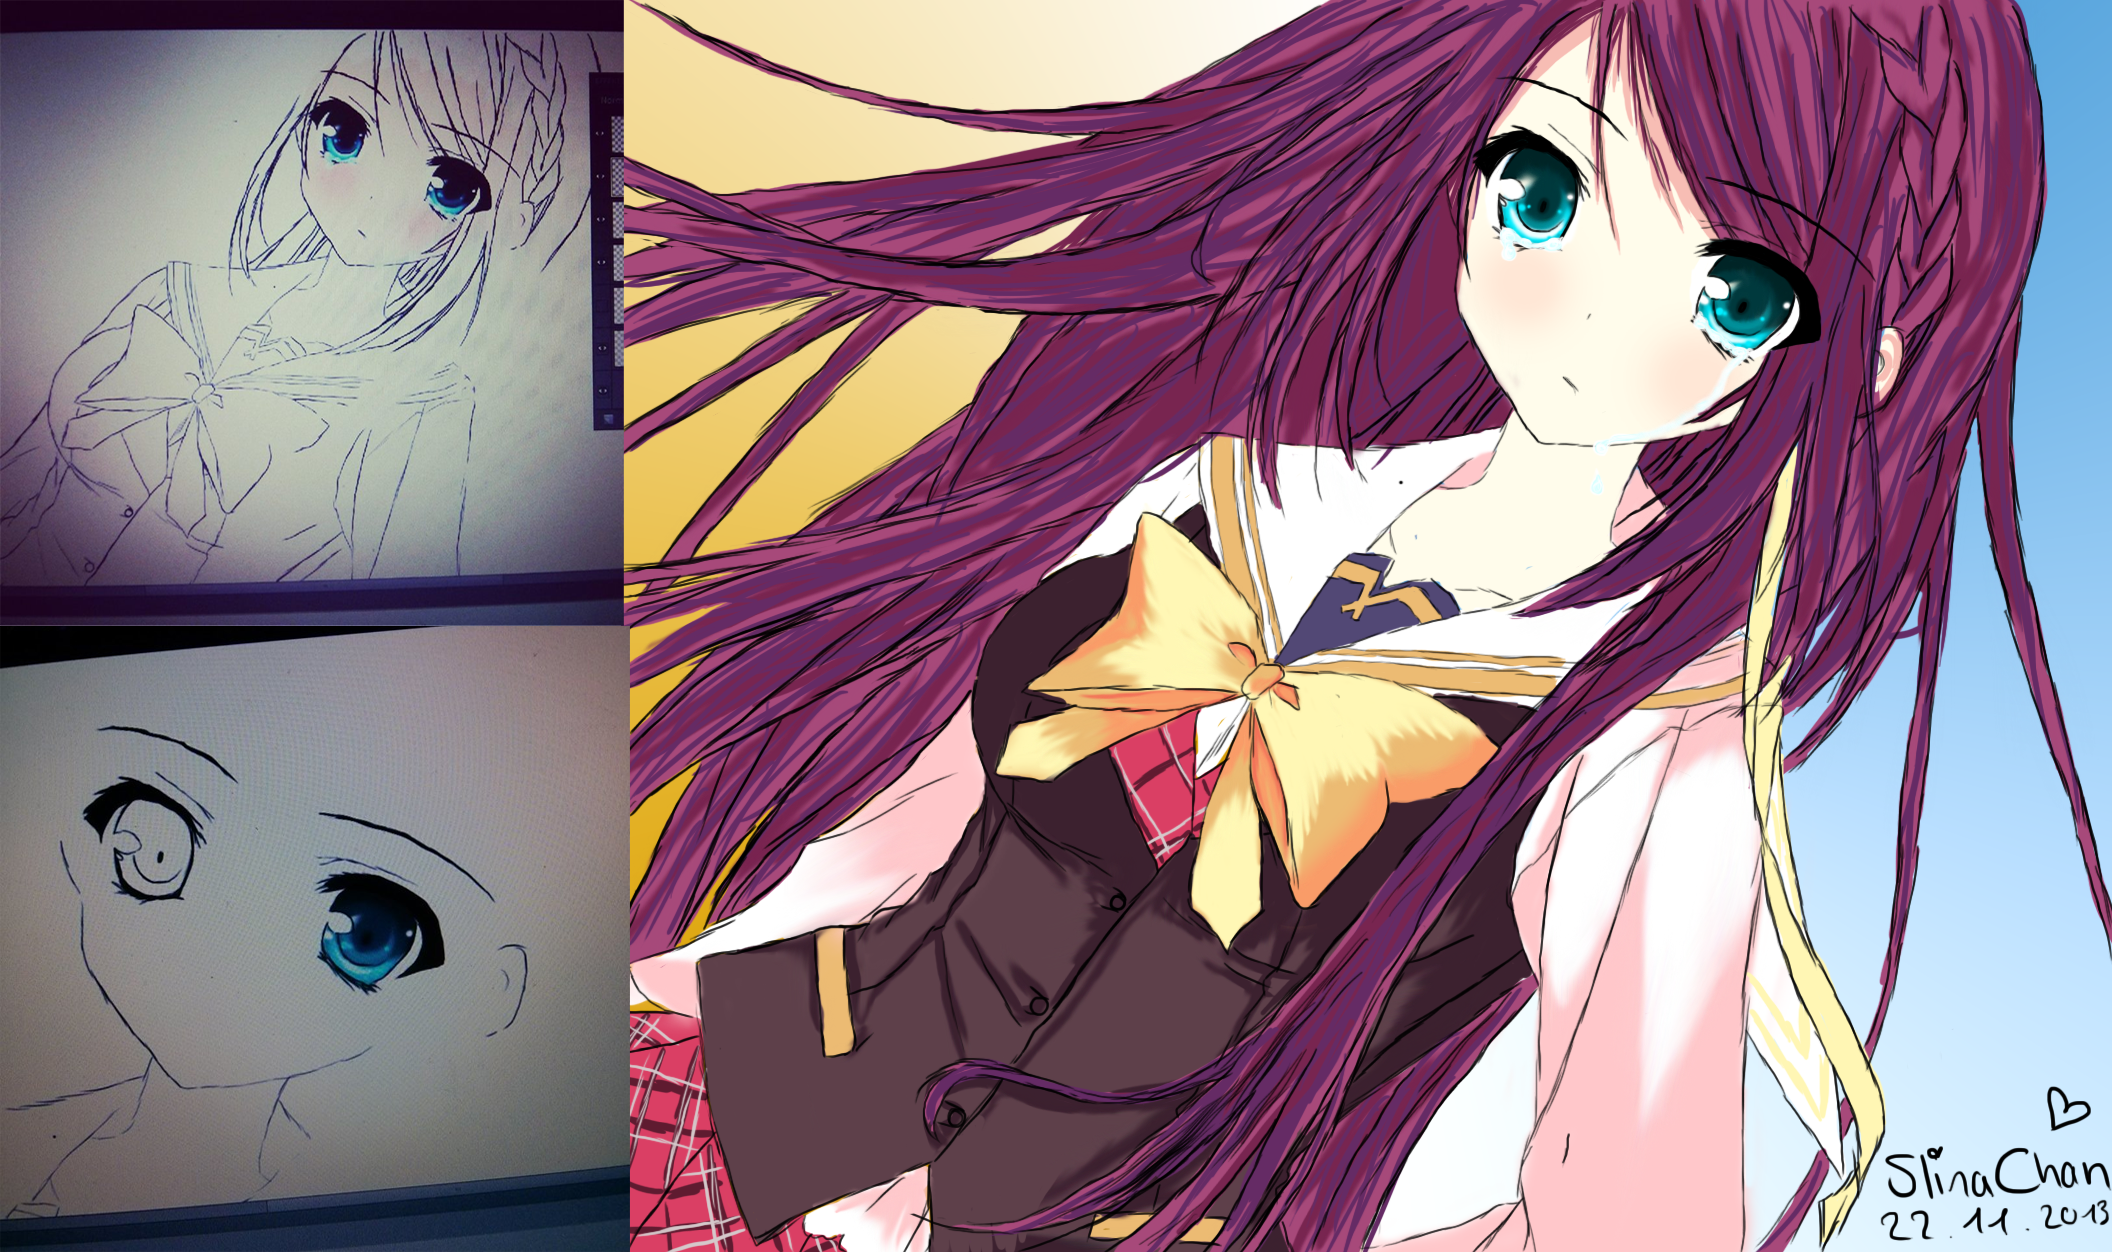 Anime Girl Digital Drawing Purple Hair By Misa-Slina On DeviantART